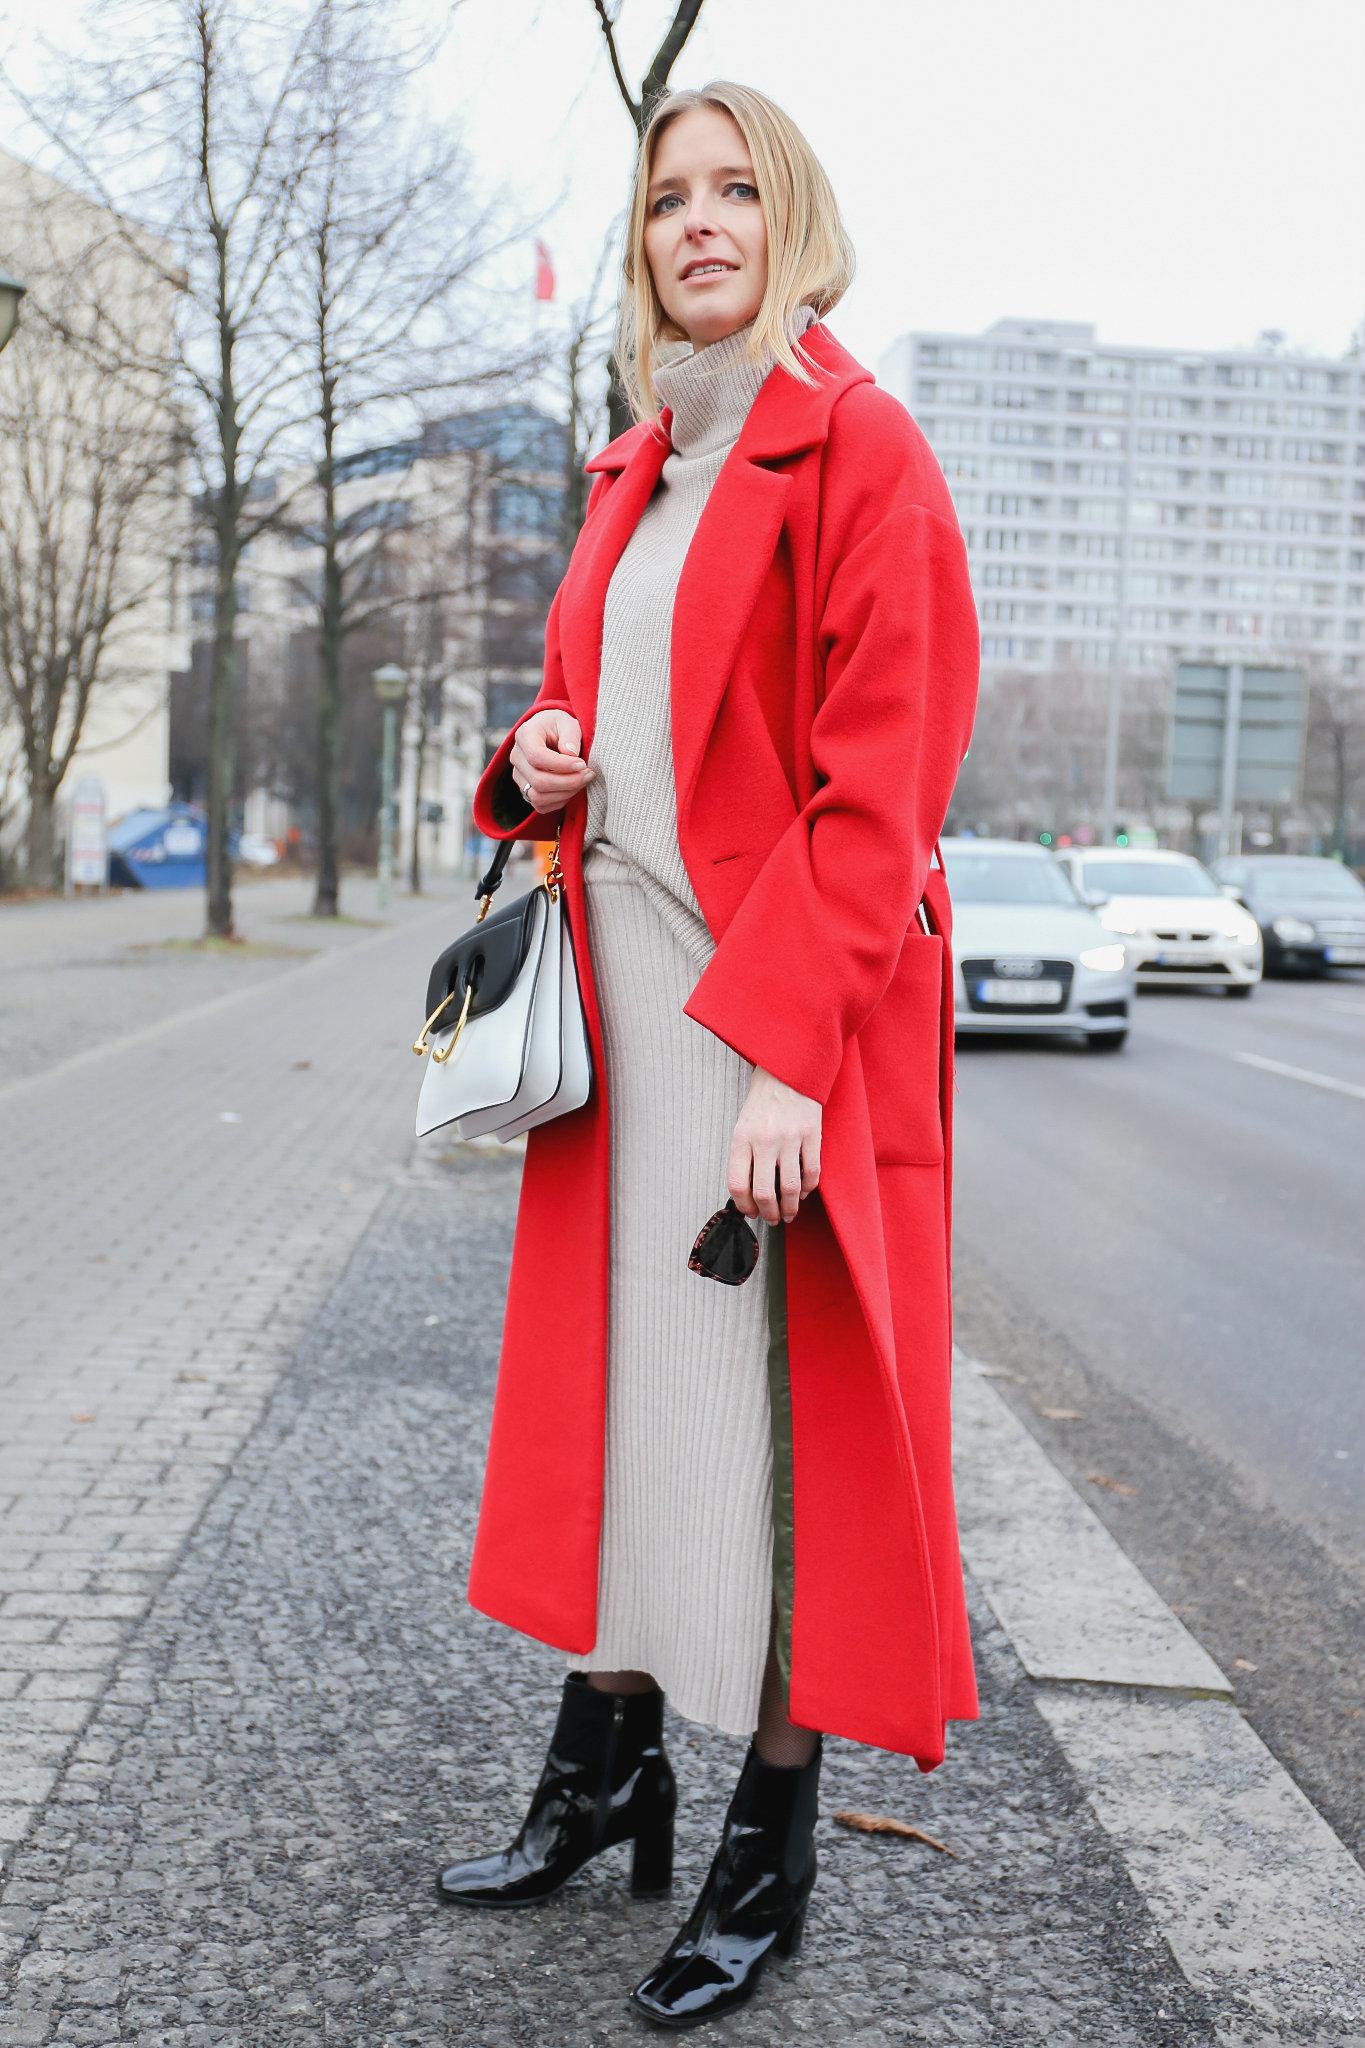 MOD-by-Monique-Fashion-Looks-MBFWB-Look-4